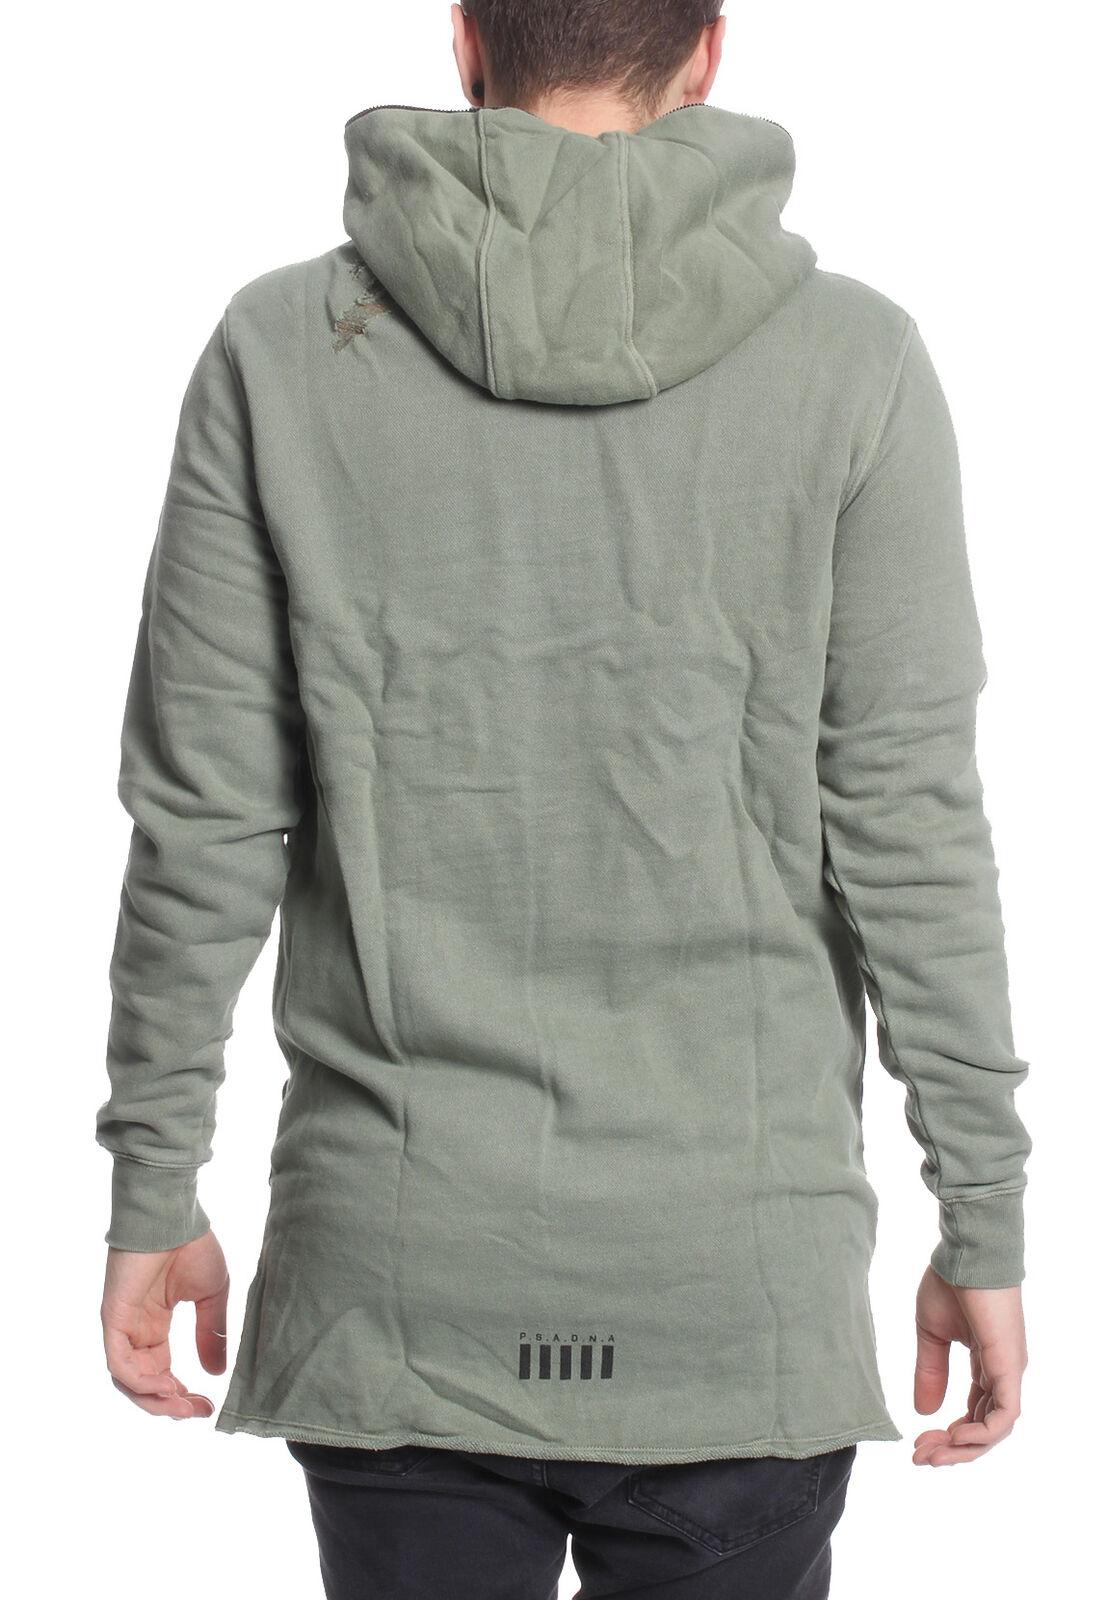 Nena & Pasadena Pasadena Pasadena Sweater Men PARATROOPER Pigment Khaki  | Verschiedene Waren  f7b450